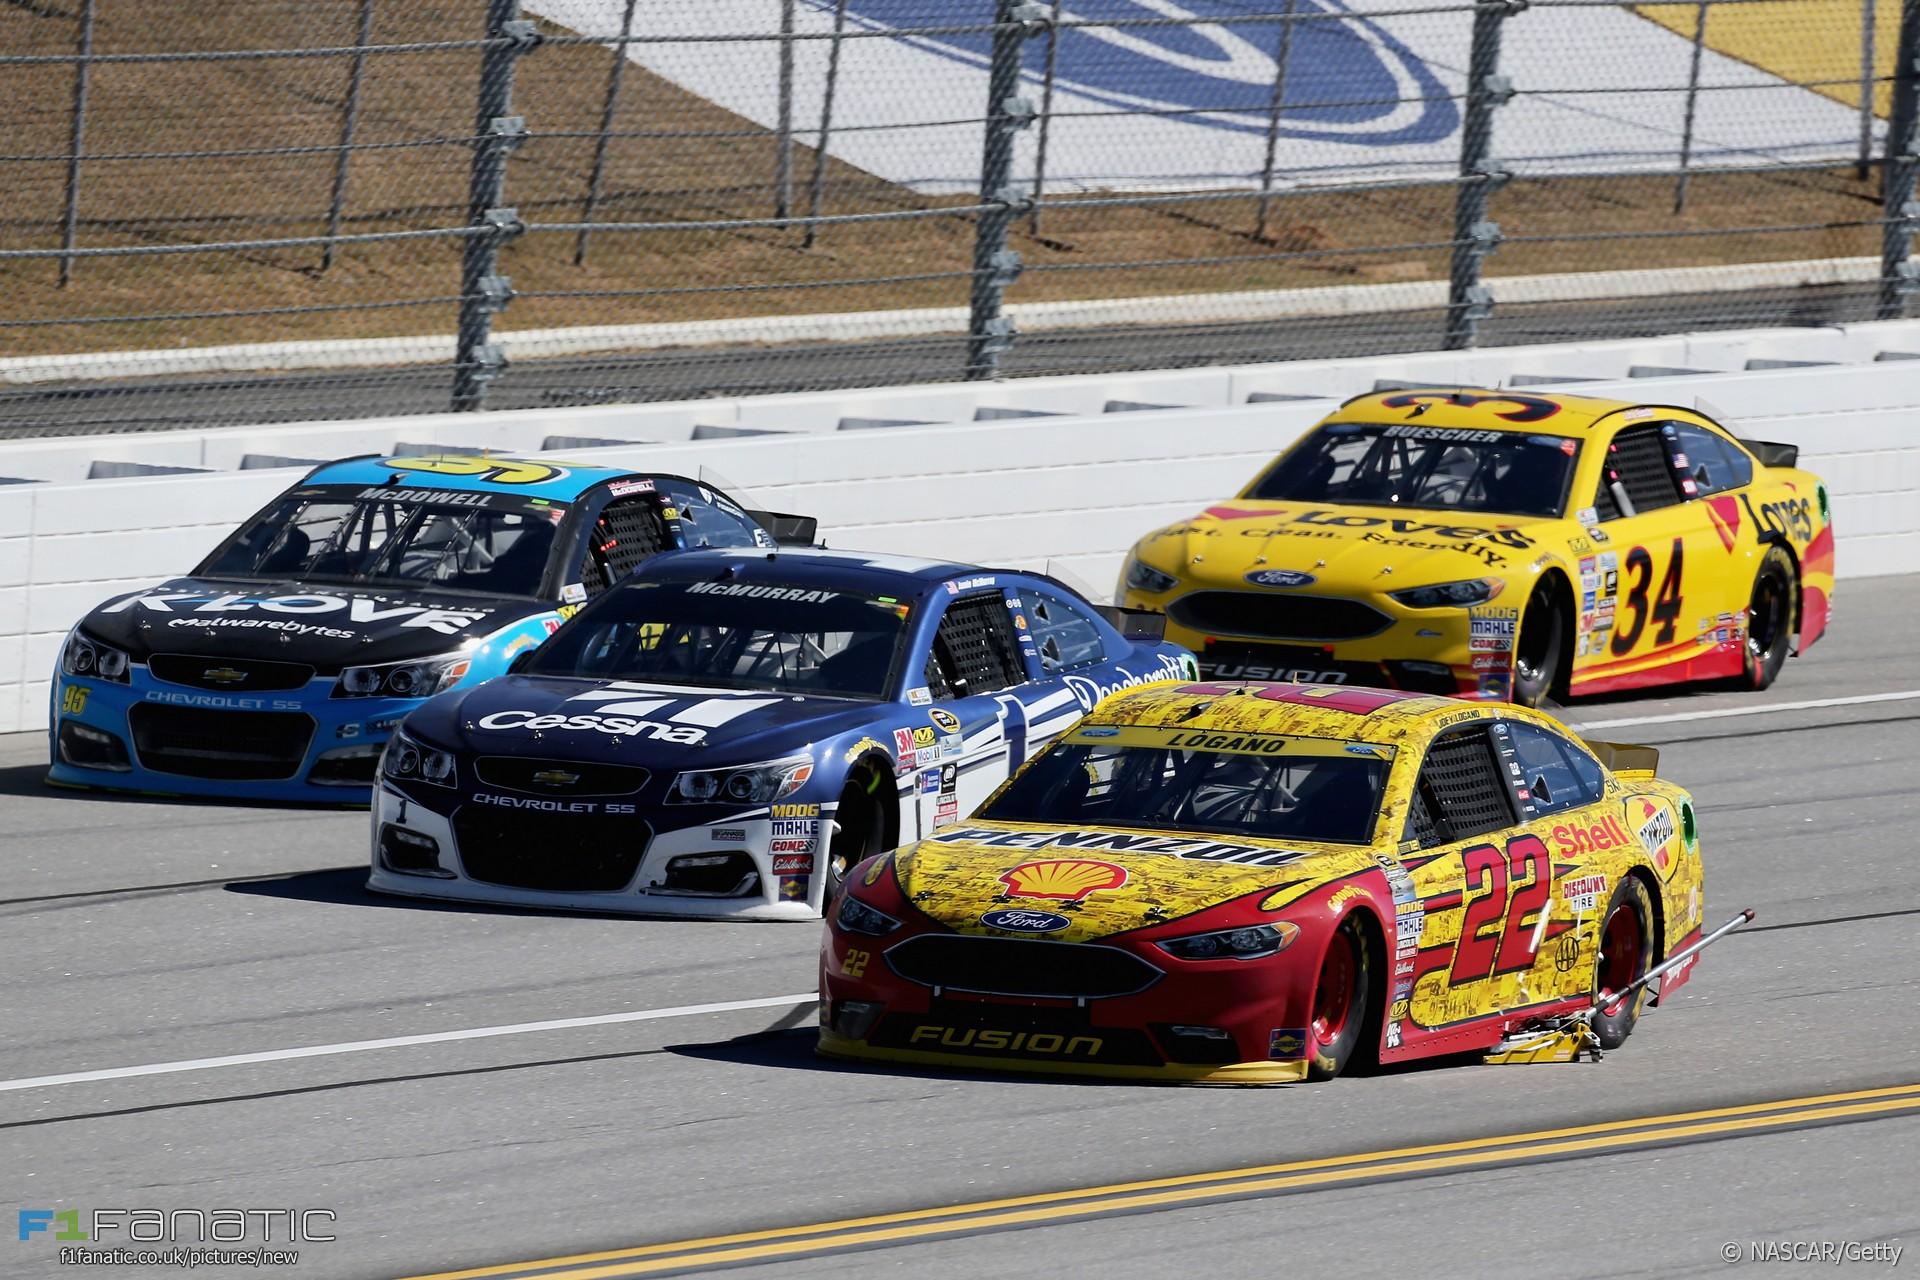 Joey Logano, NASCAR, Talladega, 2016